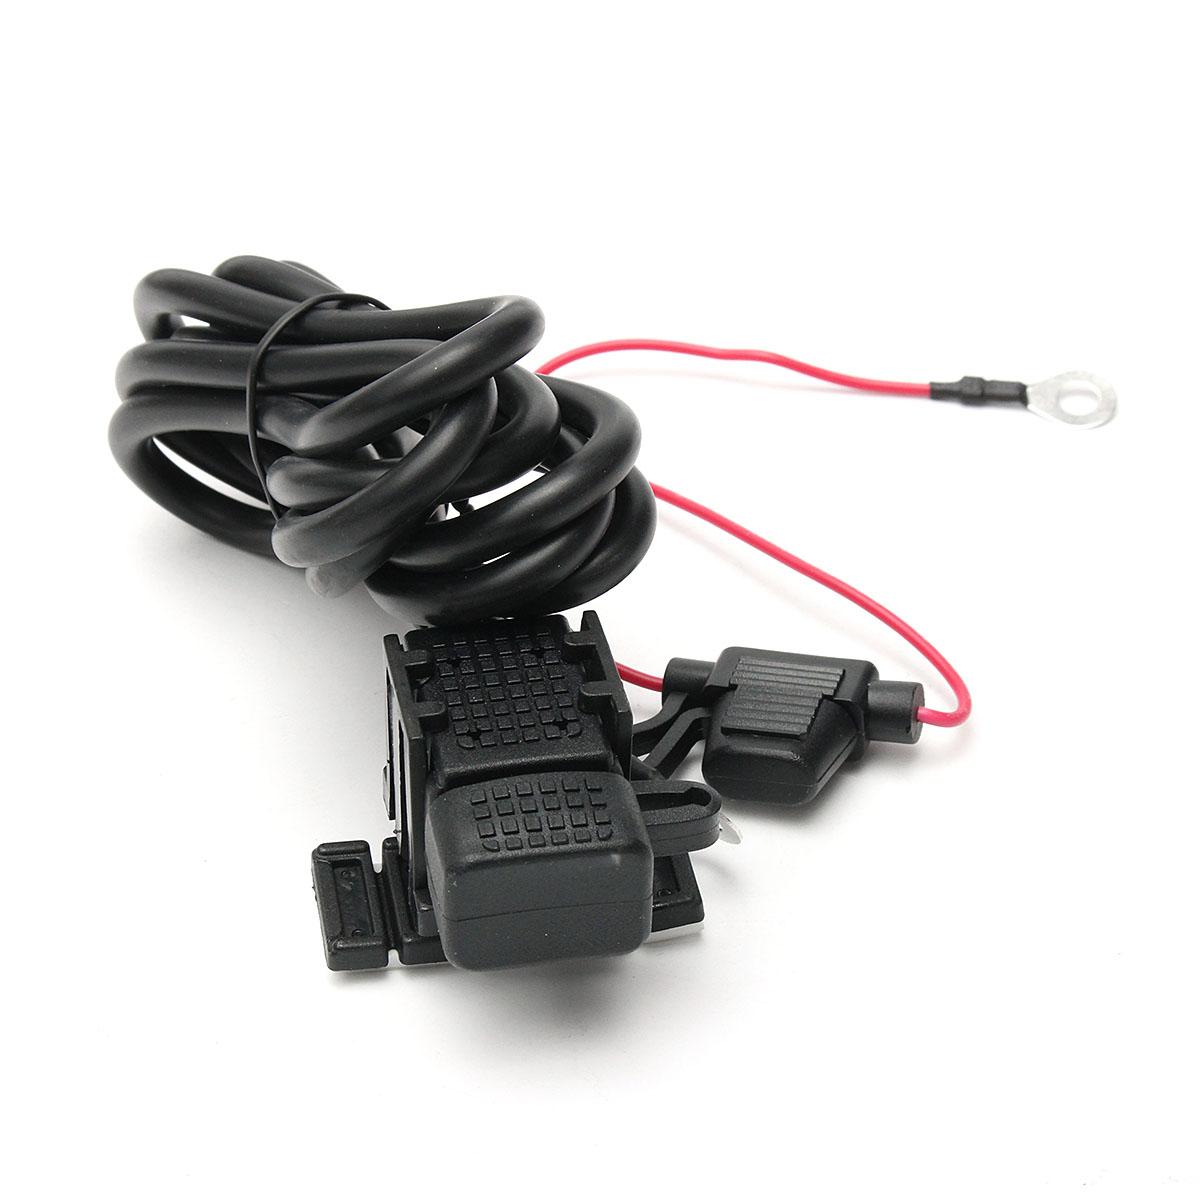 12V Waterproof Motorcycle Car Plug Socket USB Charger Adapter